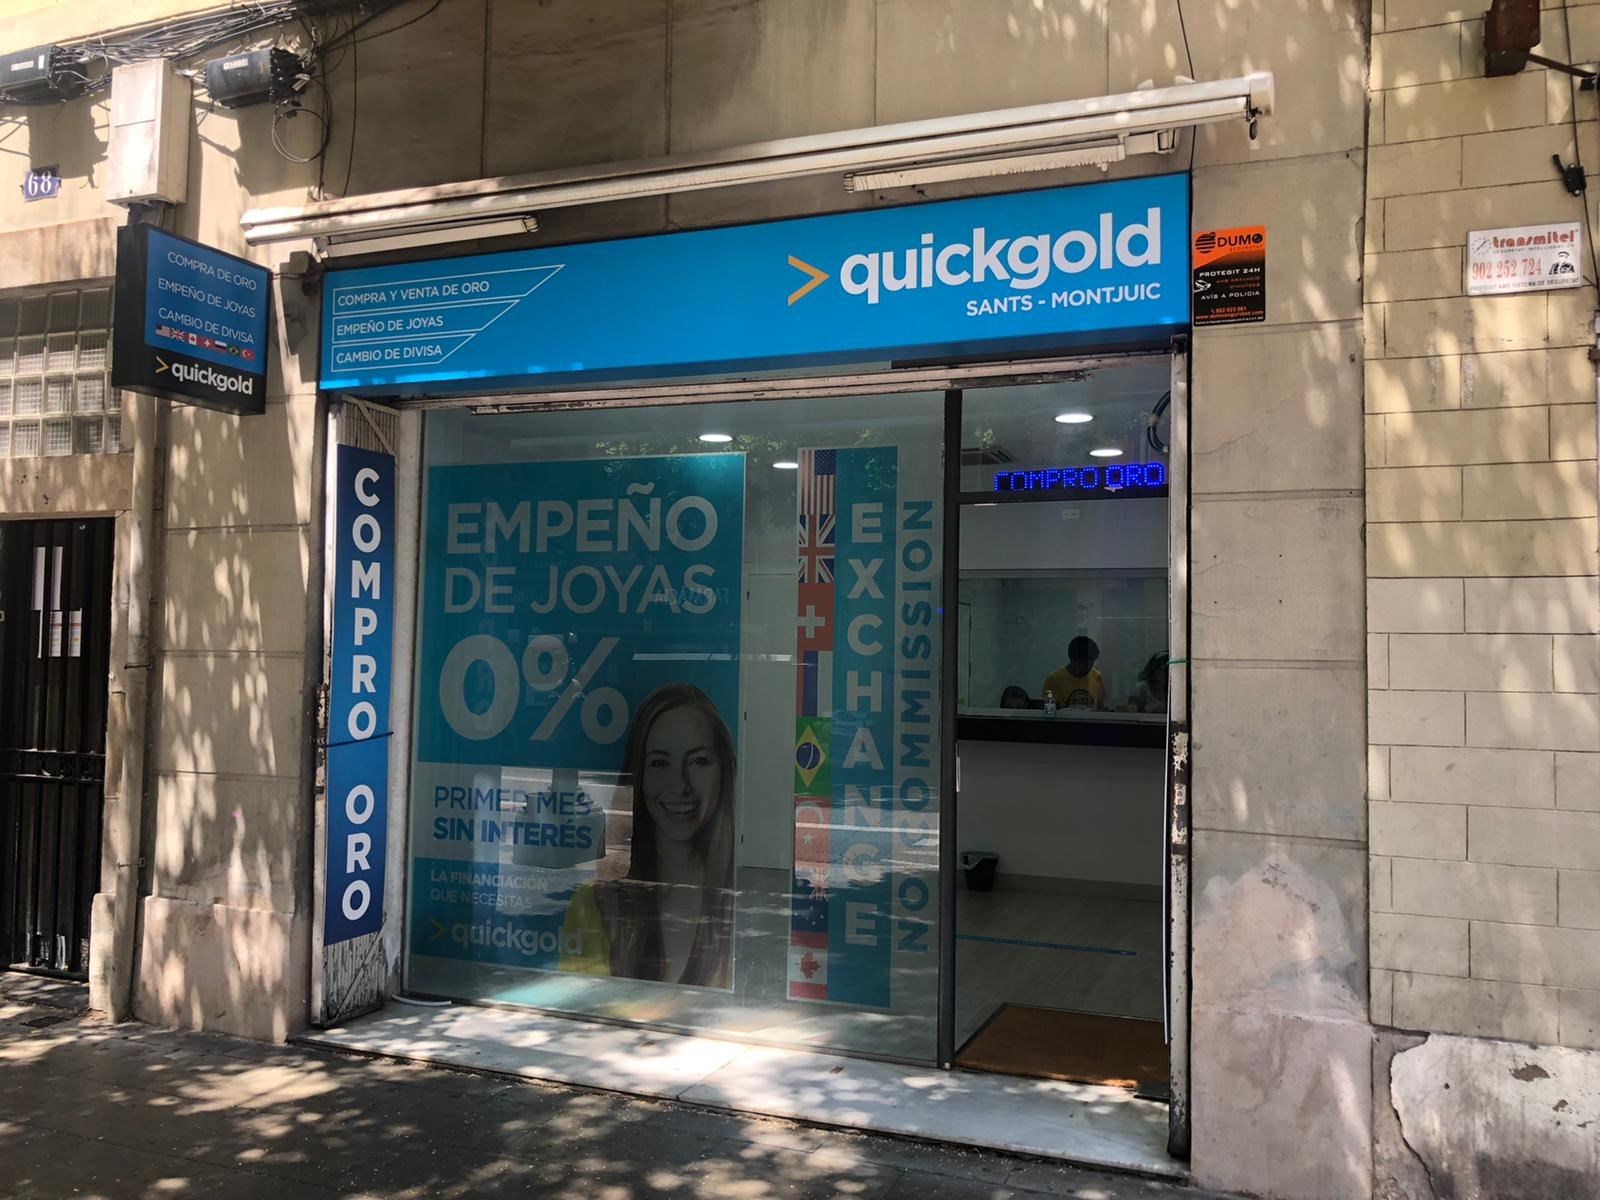 Exterior tienda Quickgold Sants-Montjuic